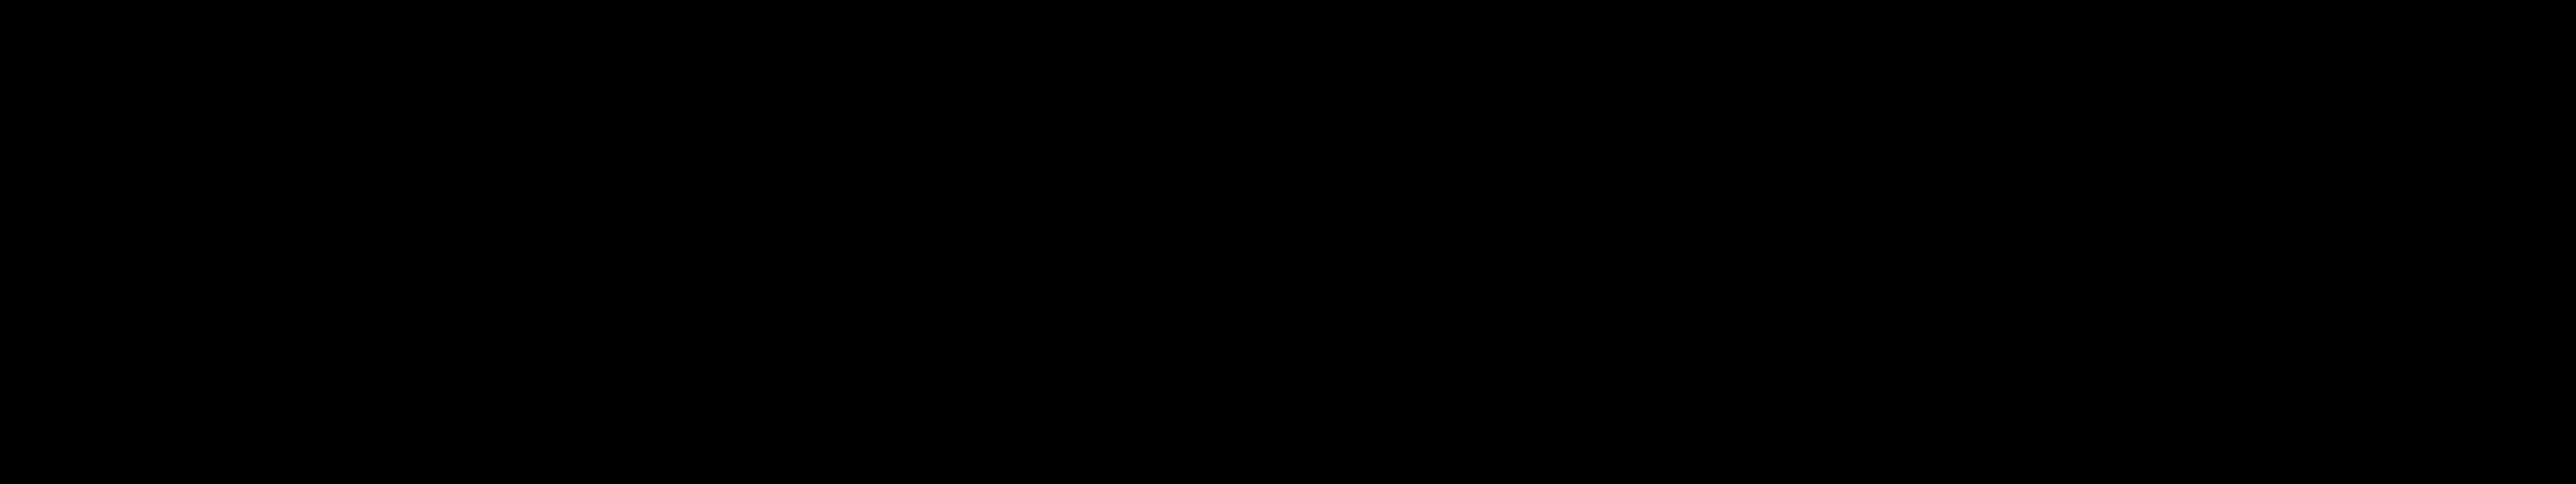 WhisperKool_Black_Logo_RGB_Transparent